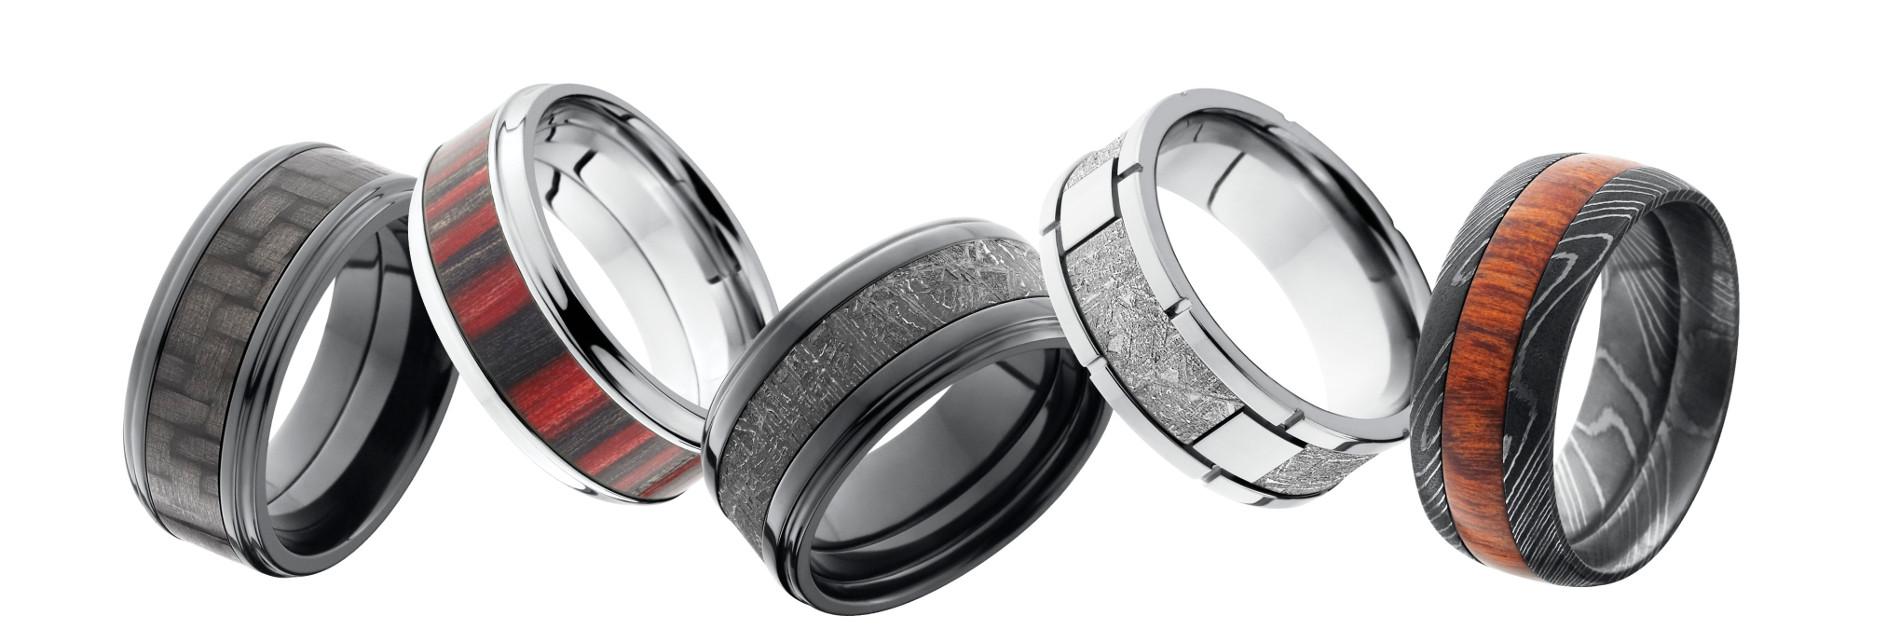 5-ring-stack-damascus-to-carbon.jpg